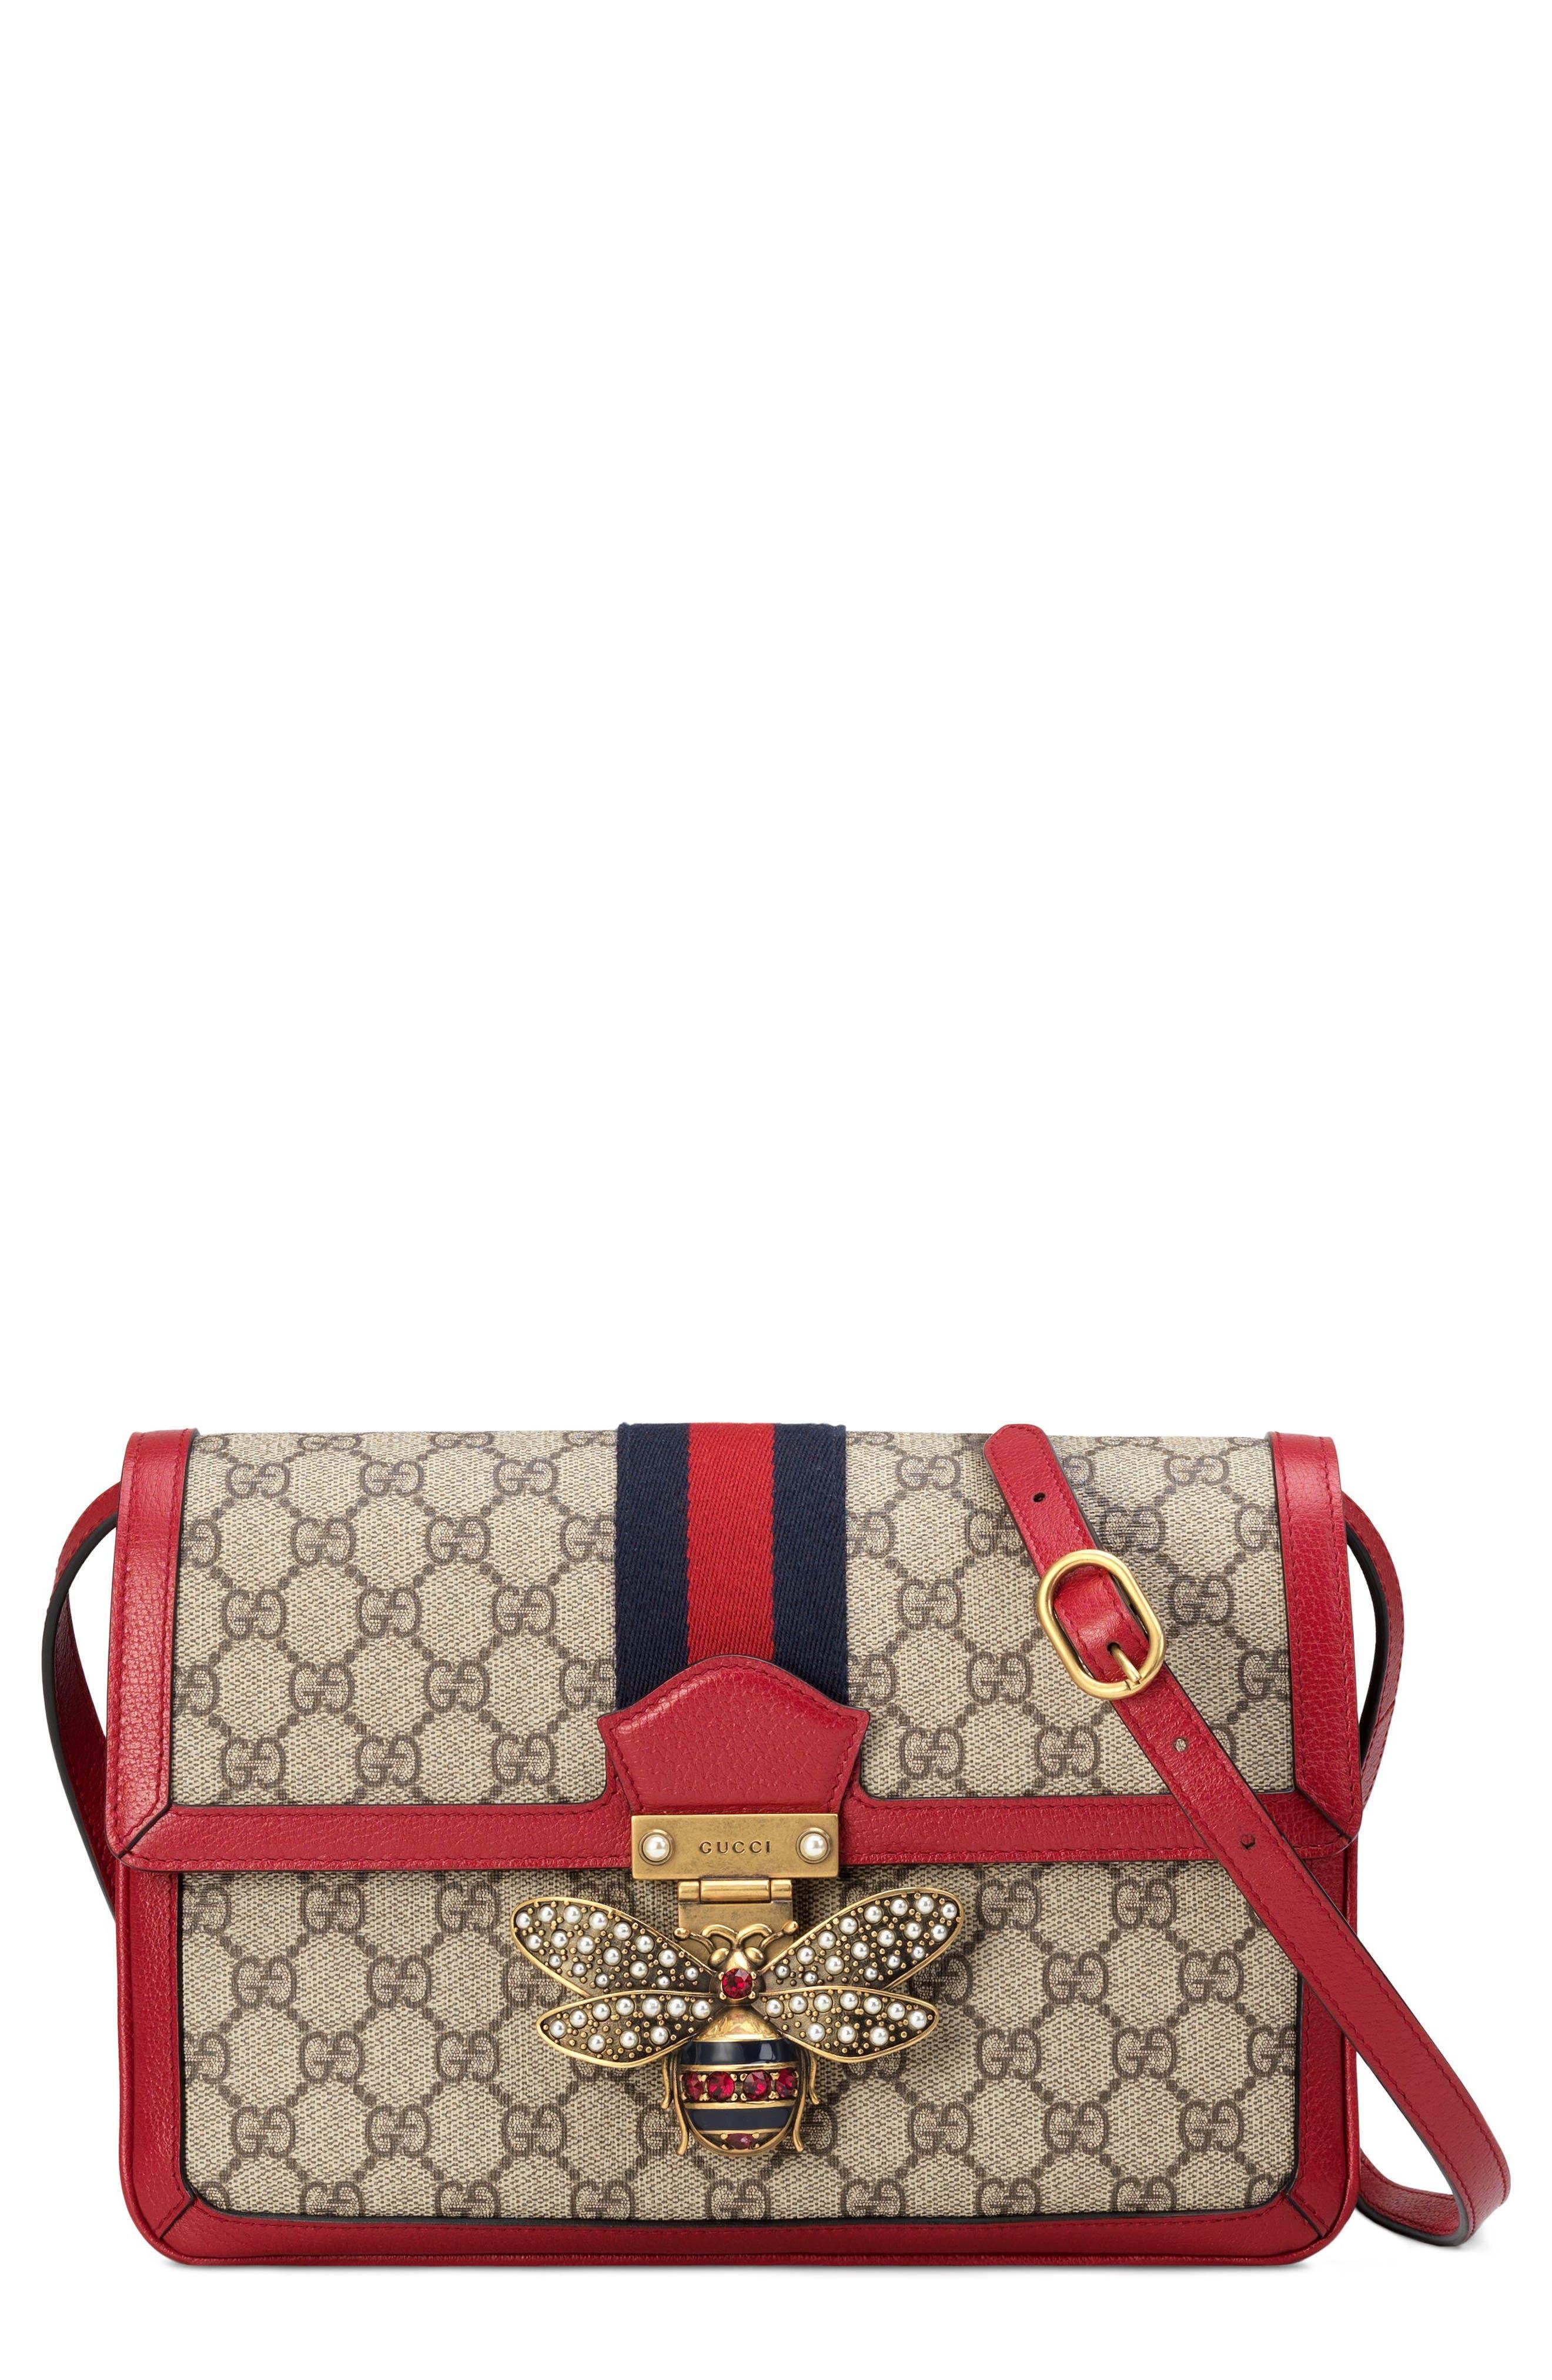 Queen Margaret GG Supreme Small Crossbody Bag,                         Main,                         color,